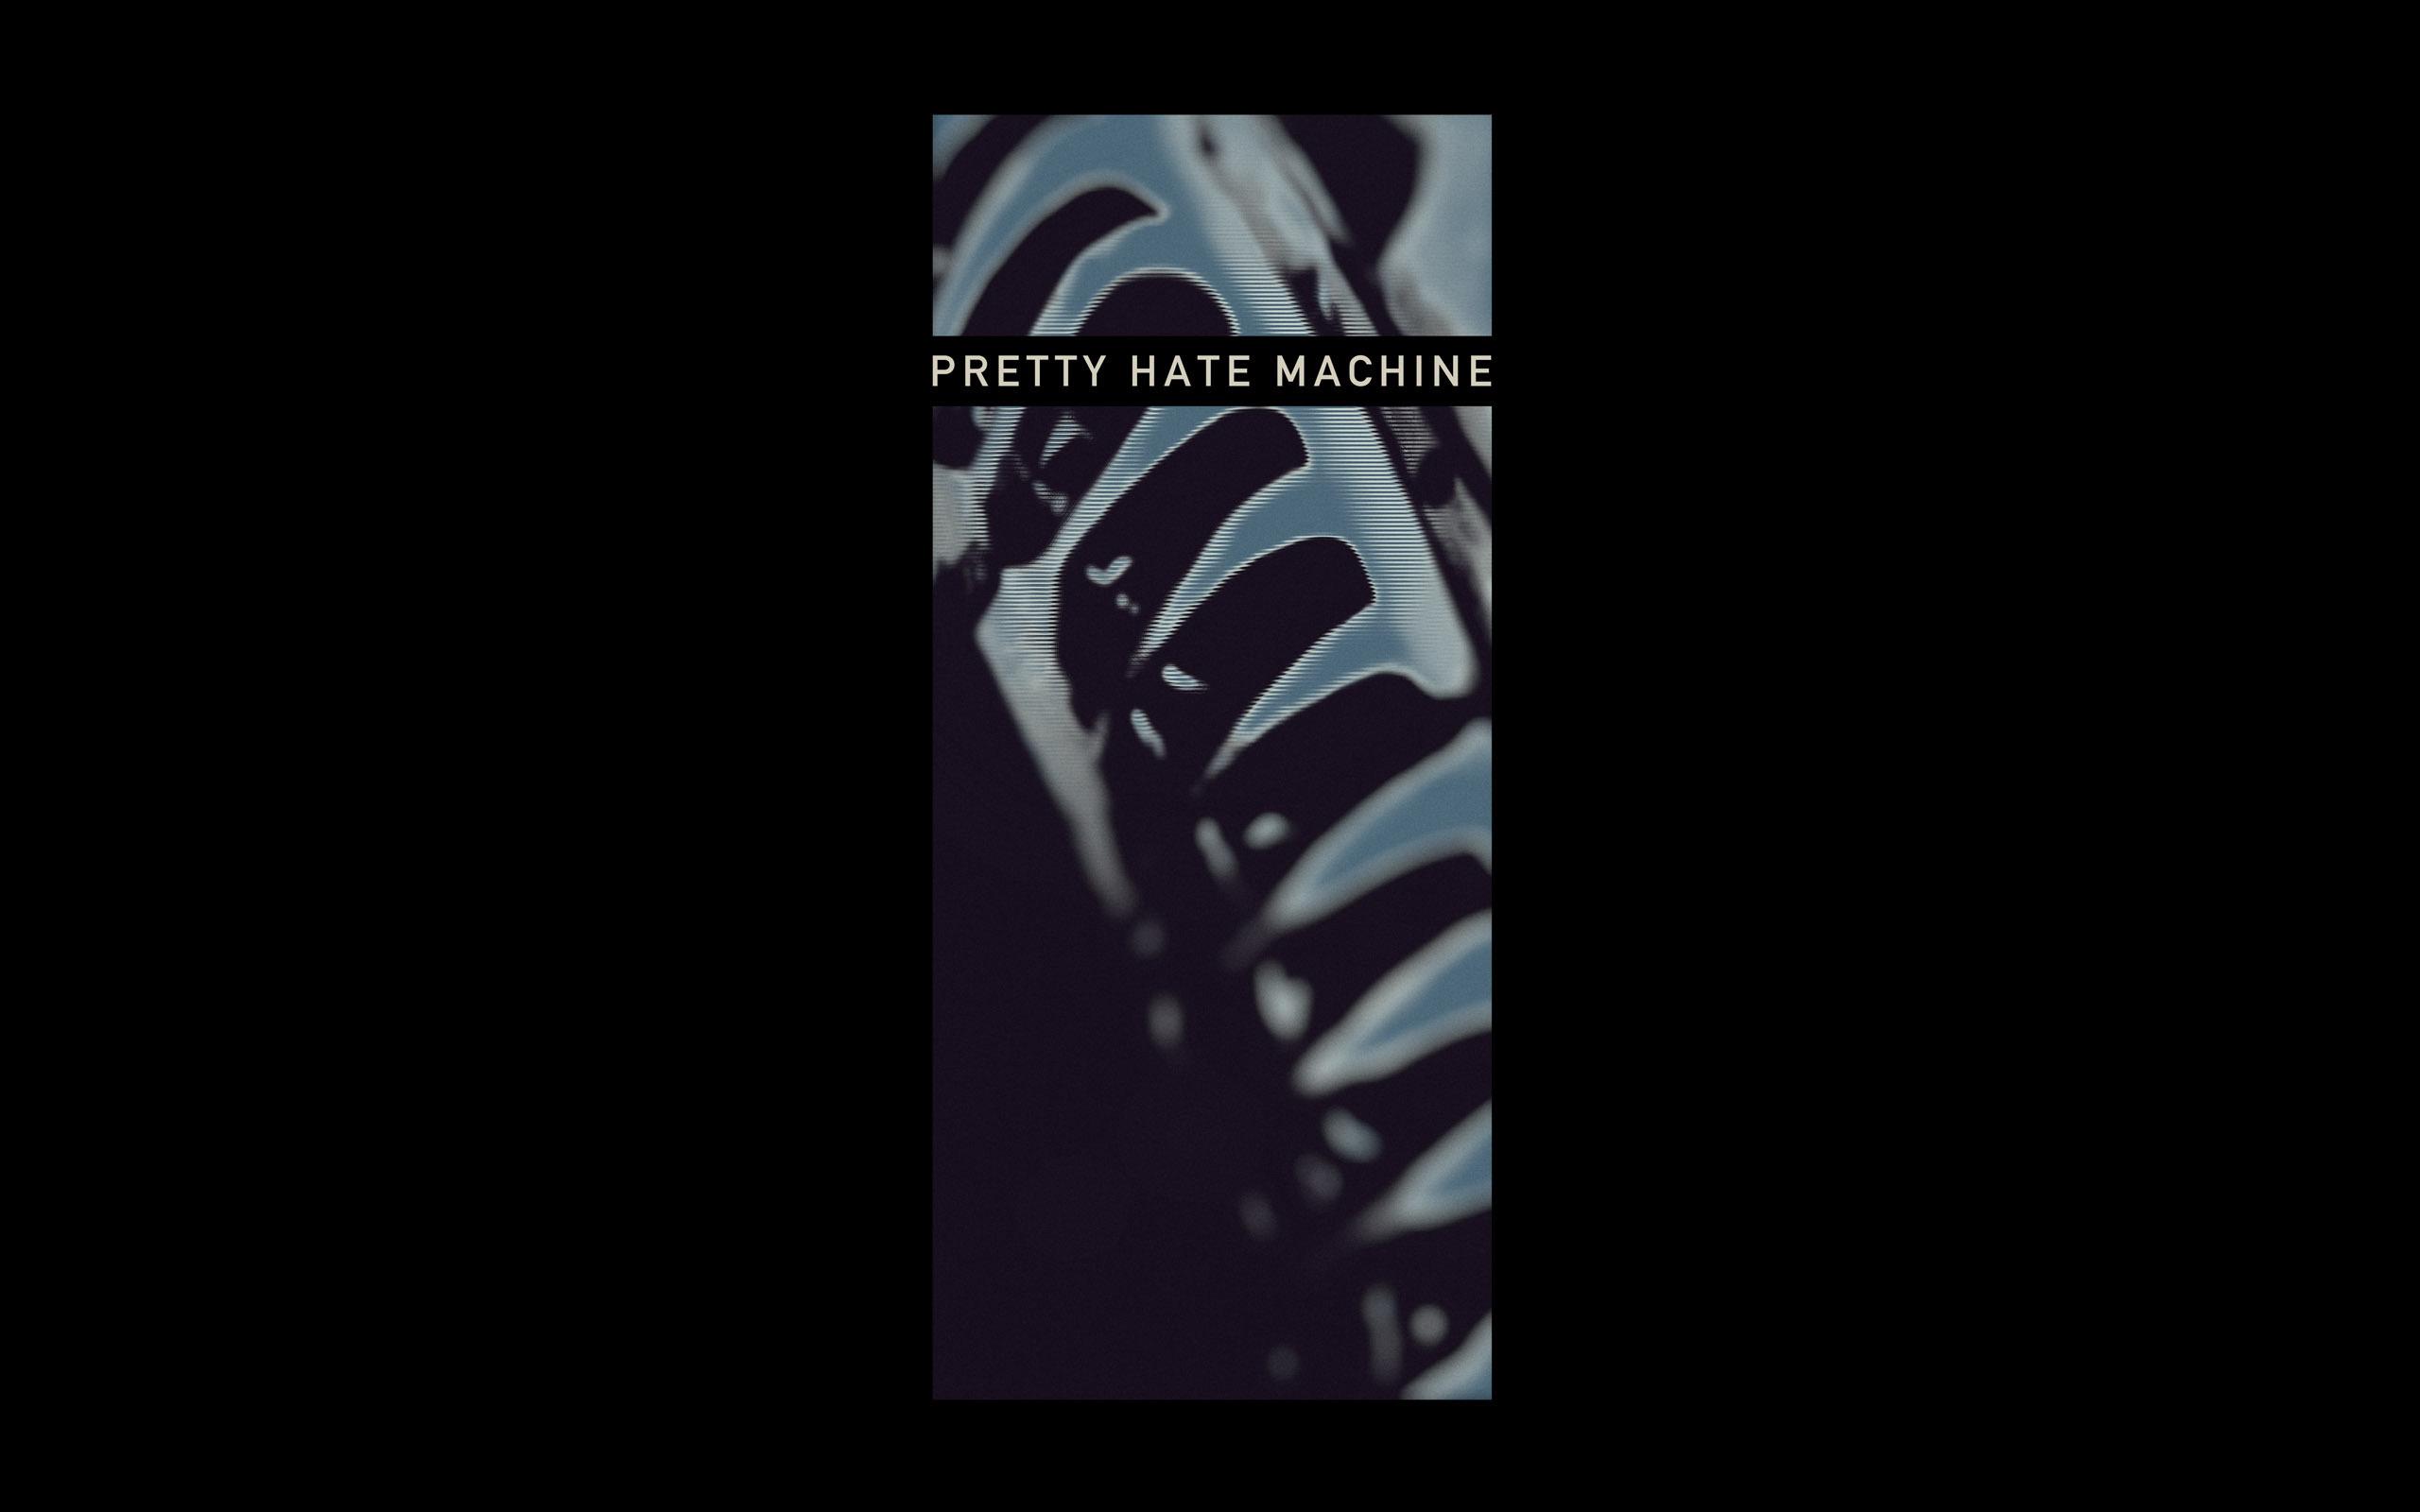 Pretty Hate Machine Nine Inch Nails Wallpaper 17262629 Fanpop